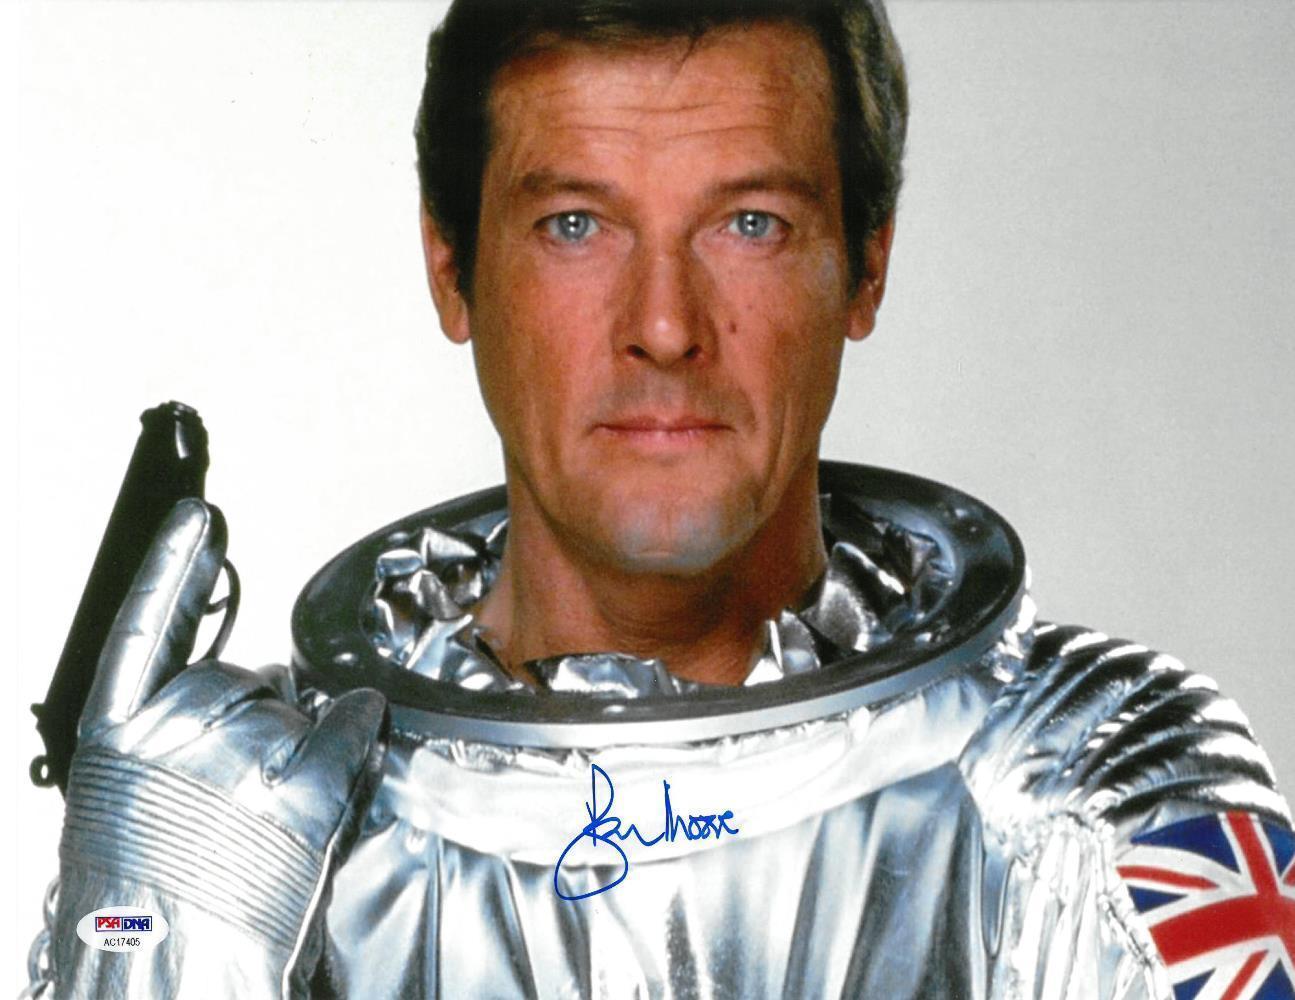 Roger Moore Signed James Bond Authentic Autographed 11x14 Photo PSA/DNA #AC17405